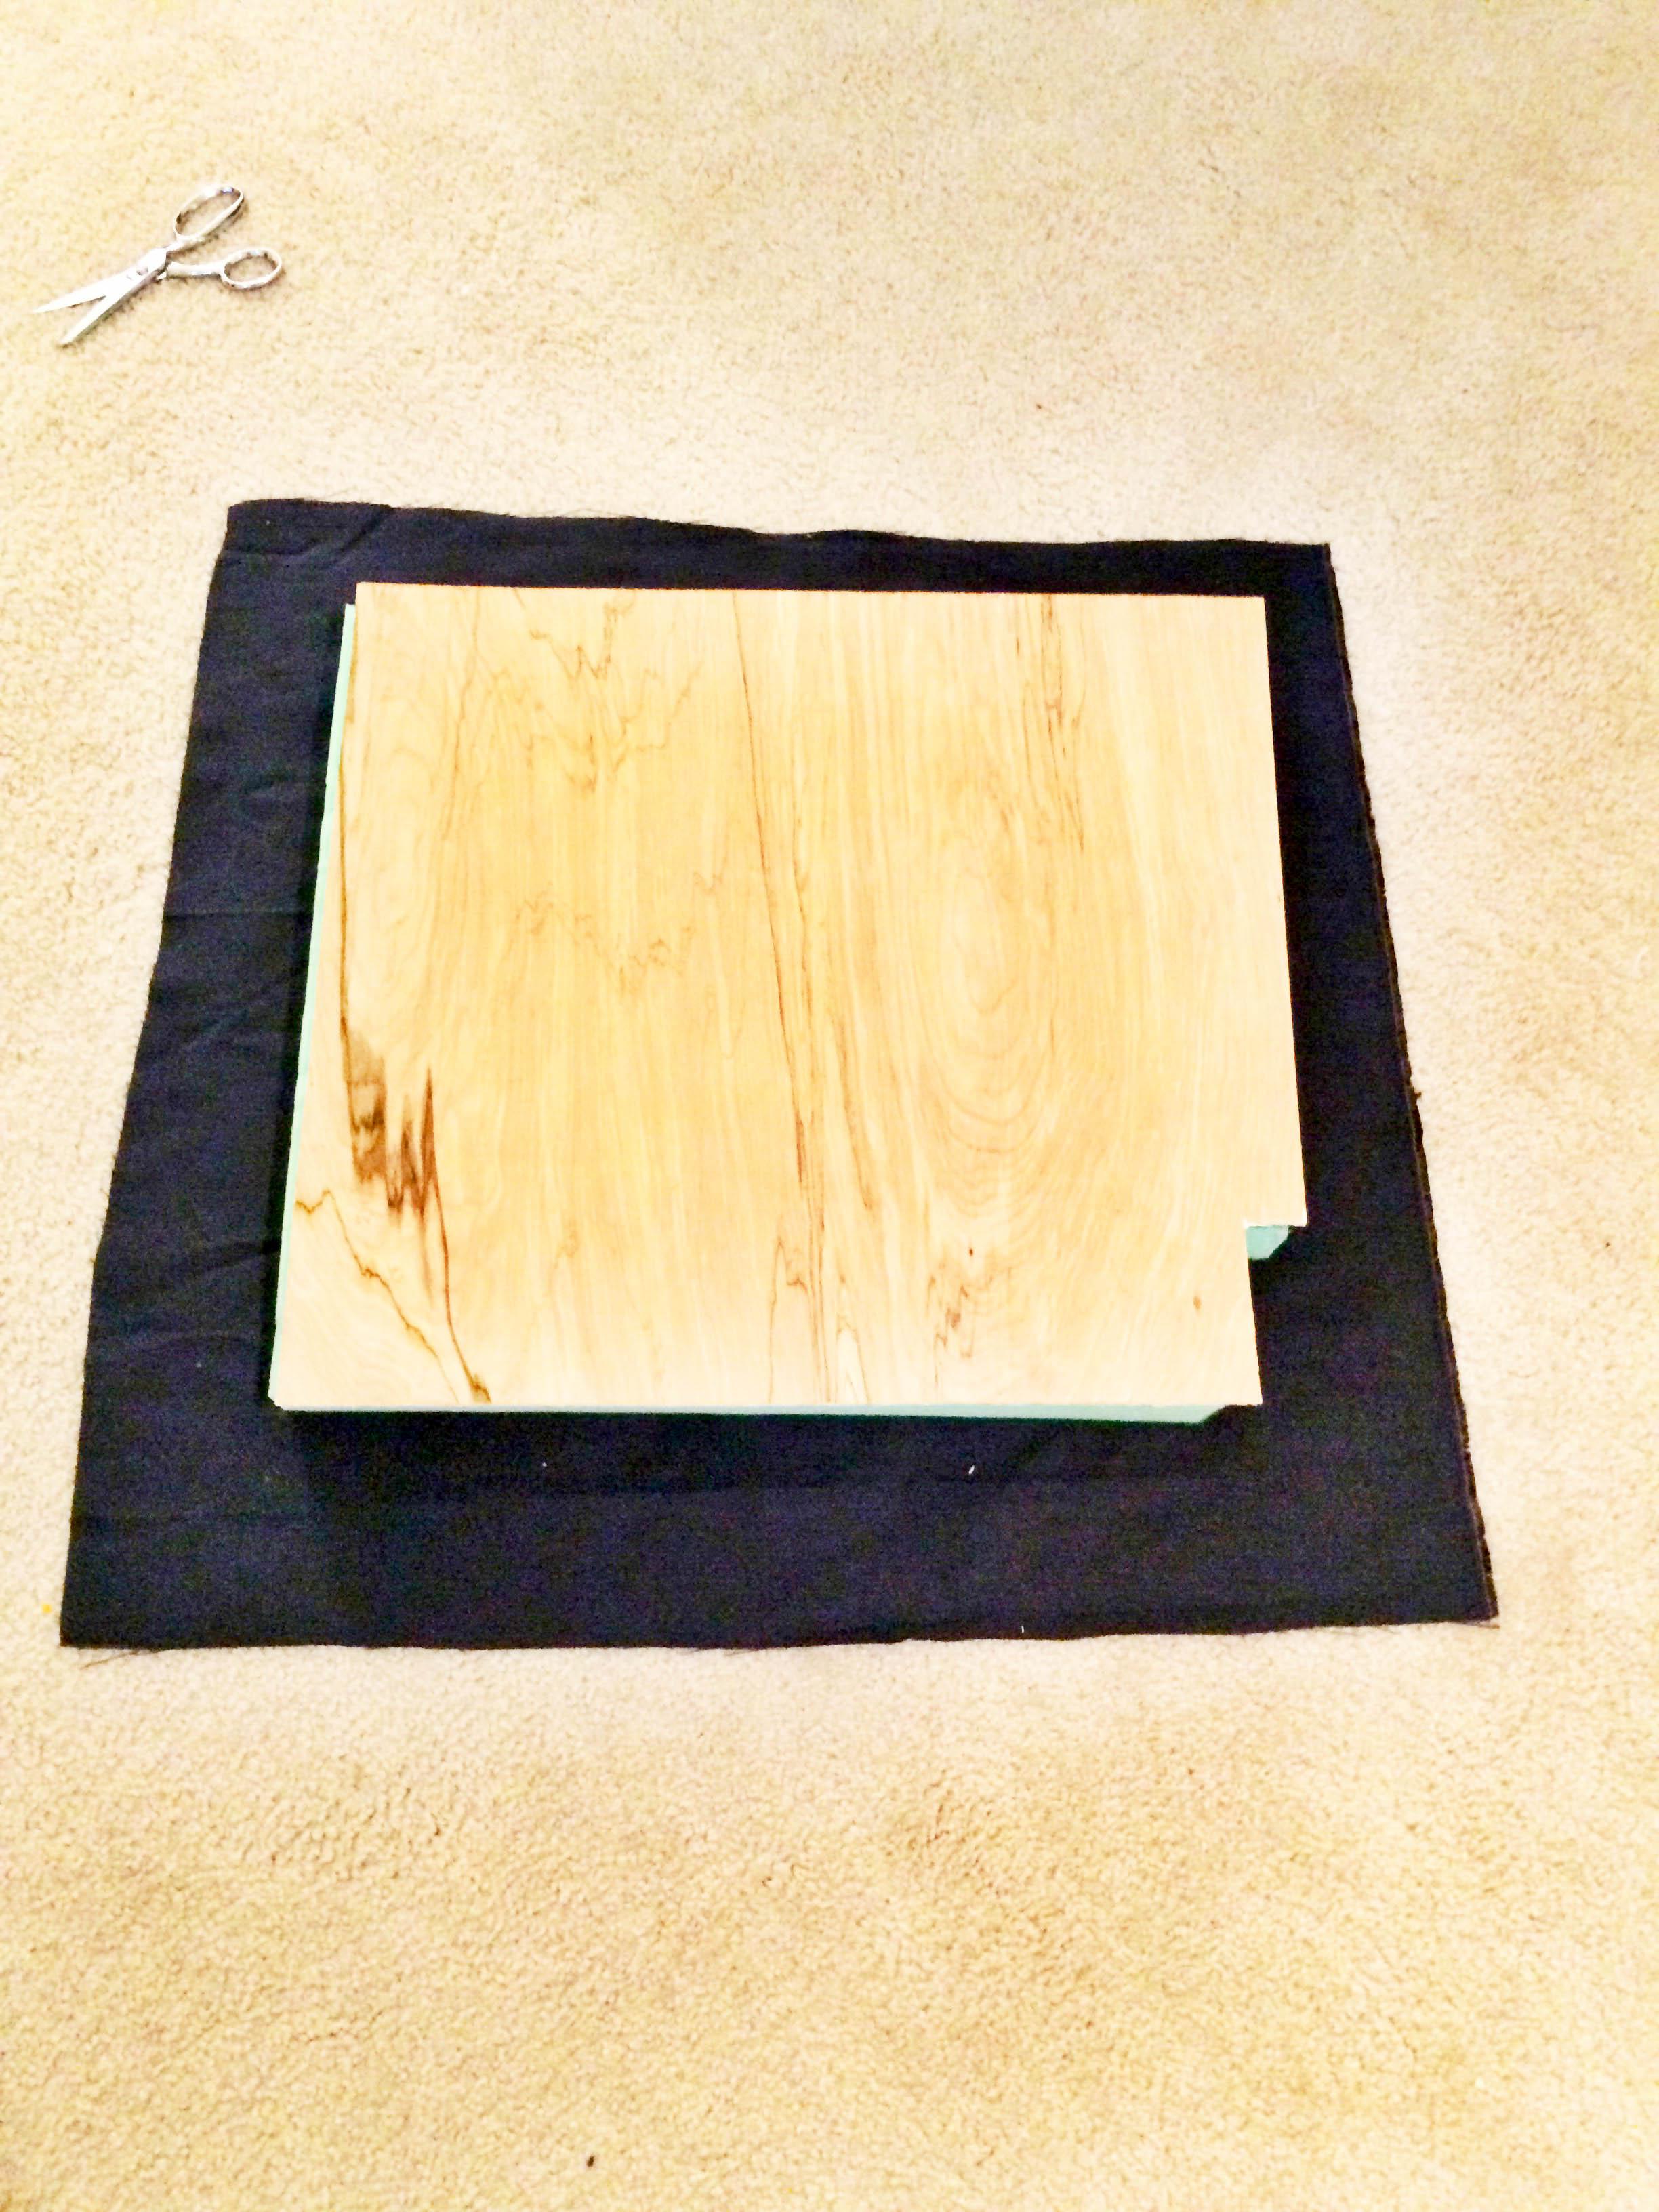 DIY Friday: Bed Frame into Bench | Breezing Through